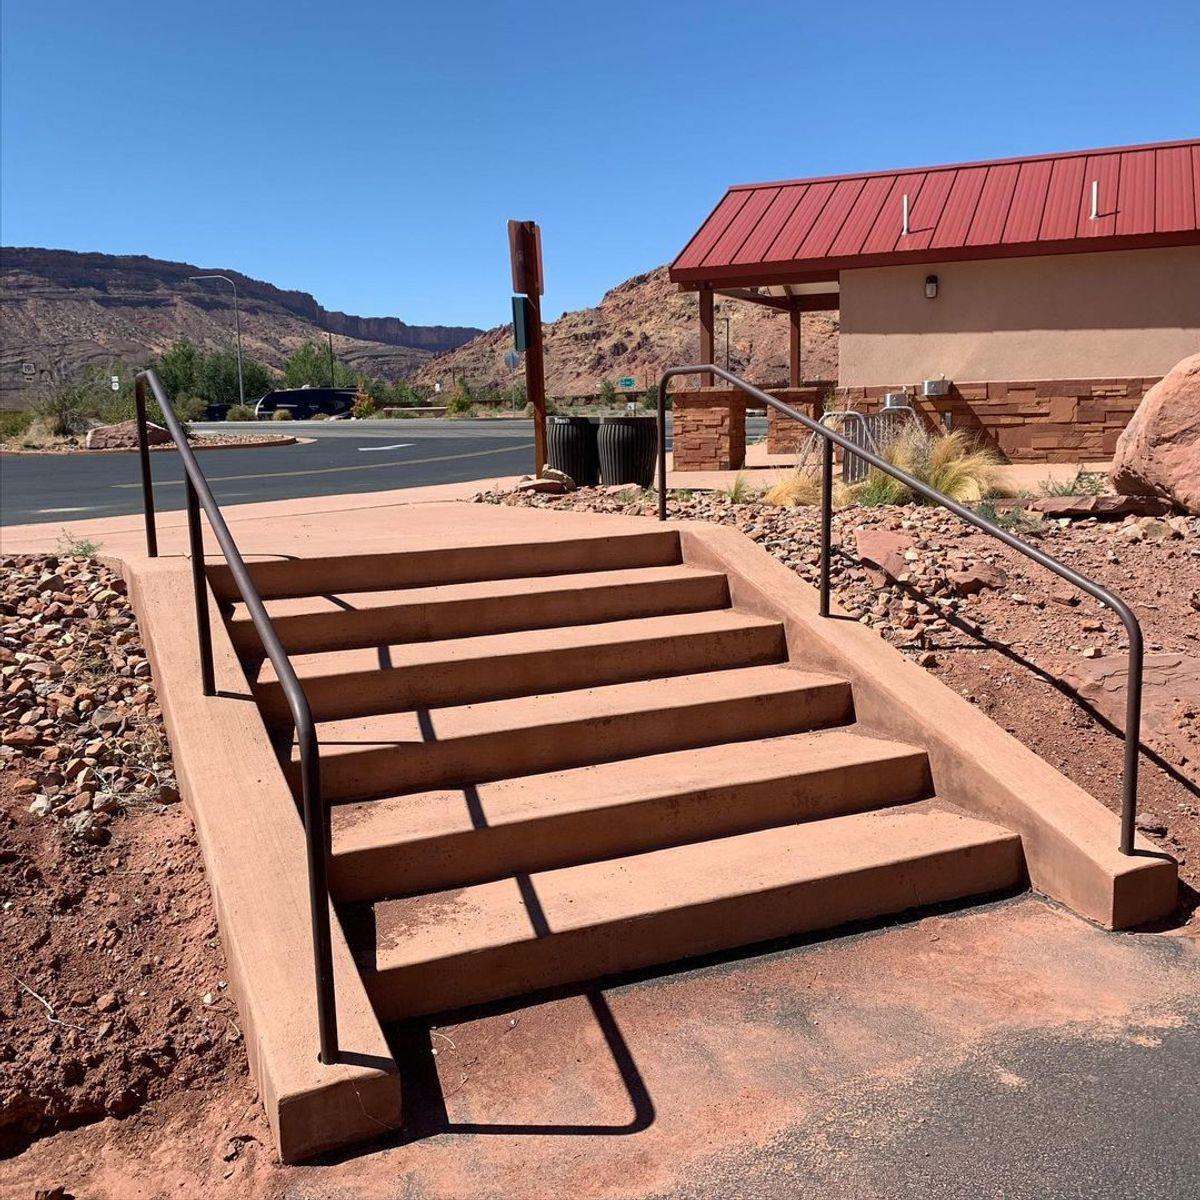 Image for skate spot Lion's Park - 6 Stair Rails